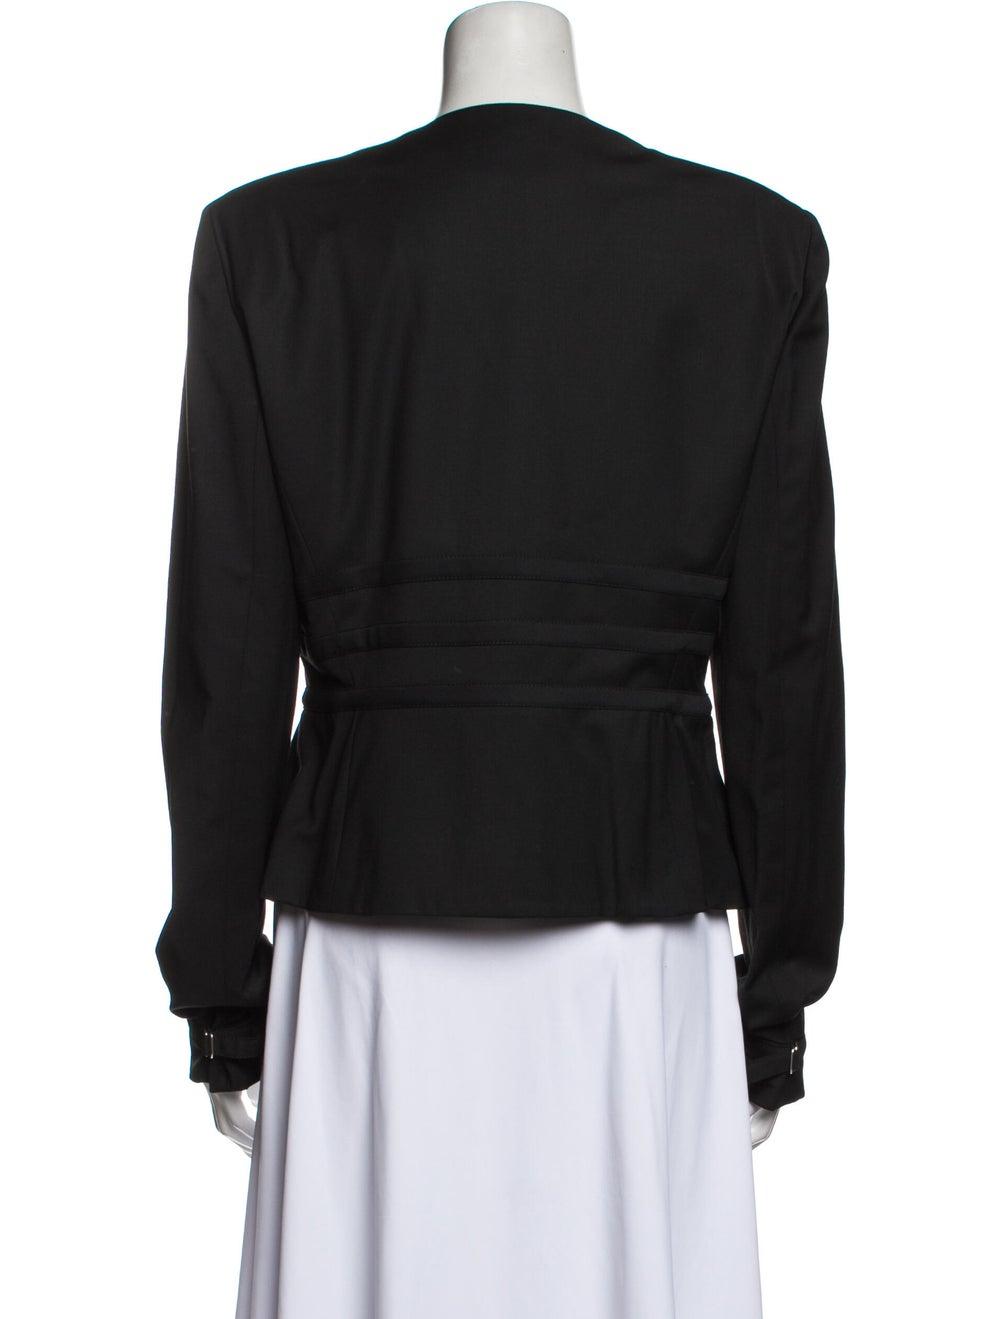 Gianni Versace Vintage Jacket Black - image 3